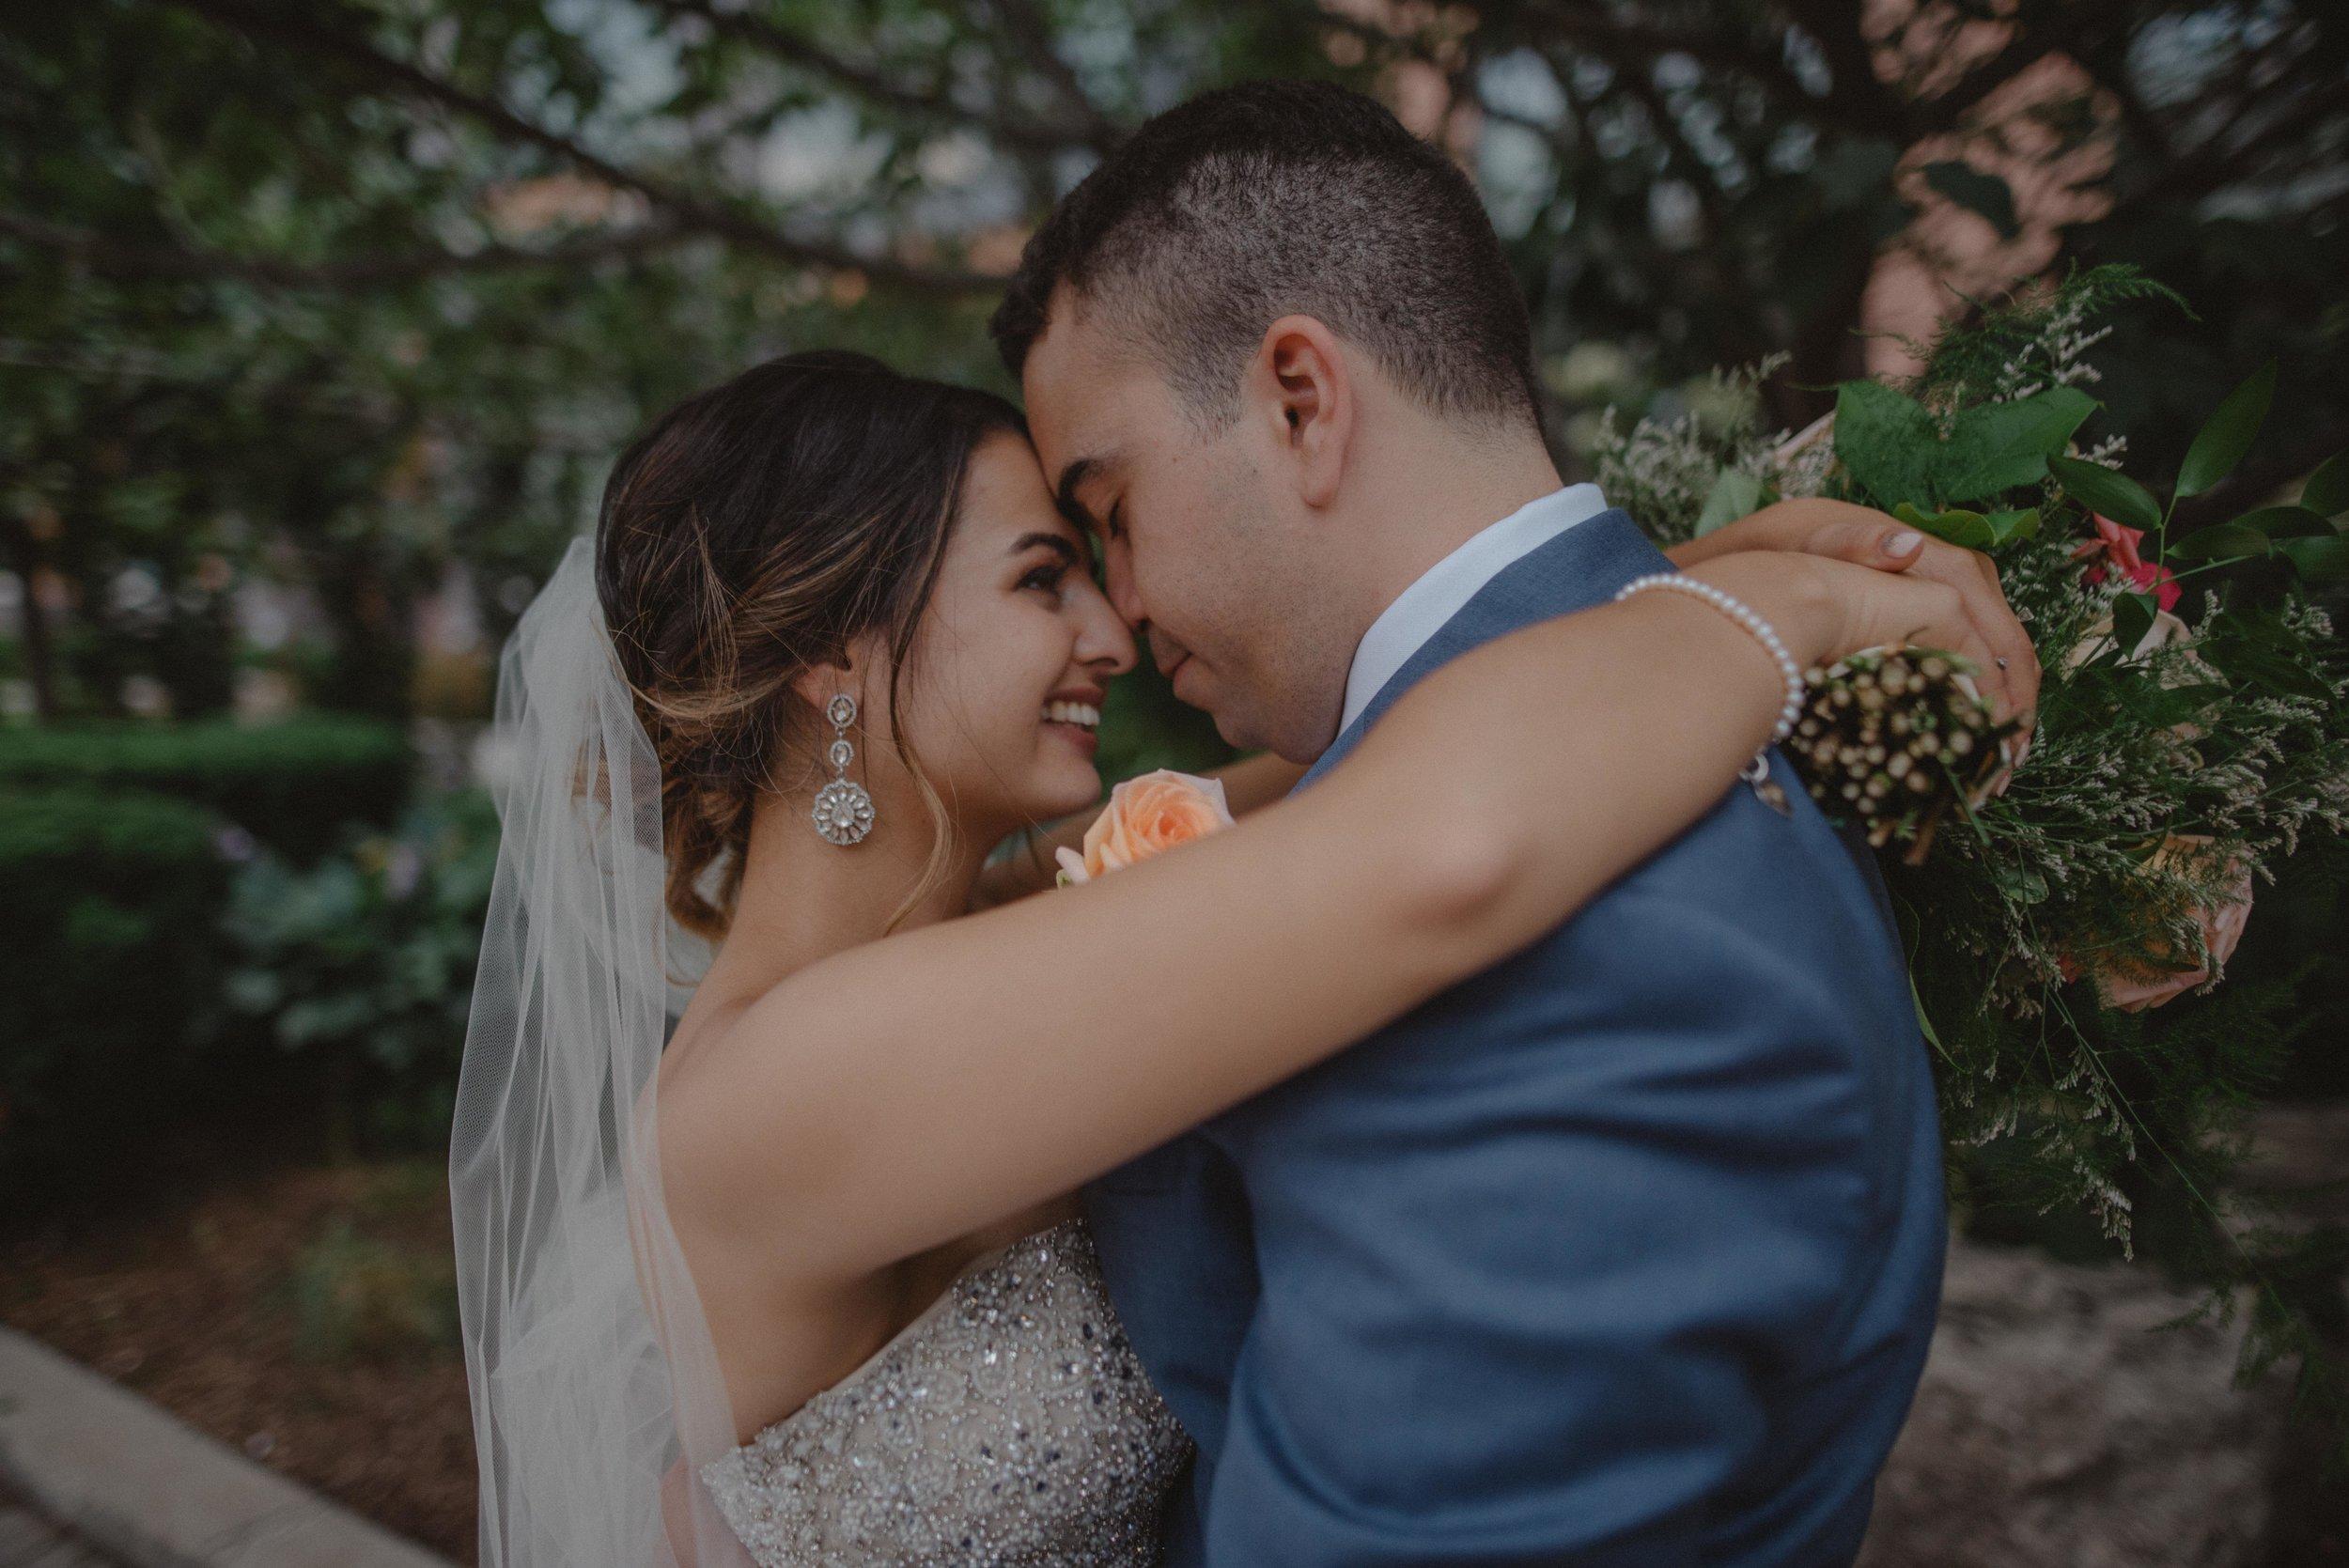 mariage_photographe_toronto_gatineau_ottawa_photographer_wedding-23.jpg